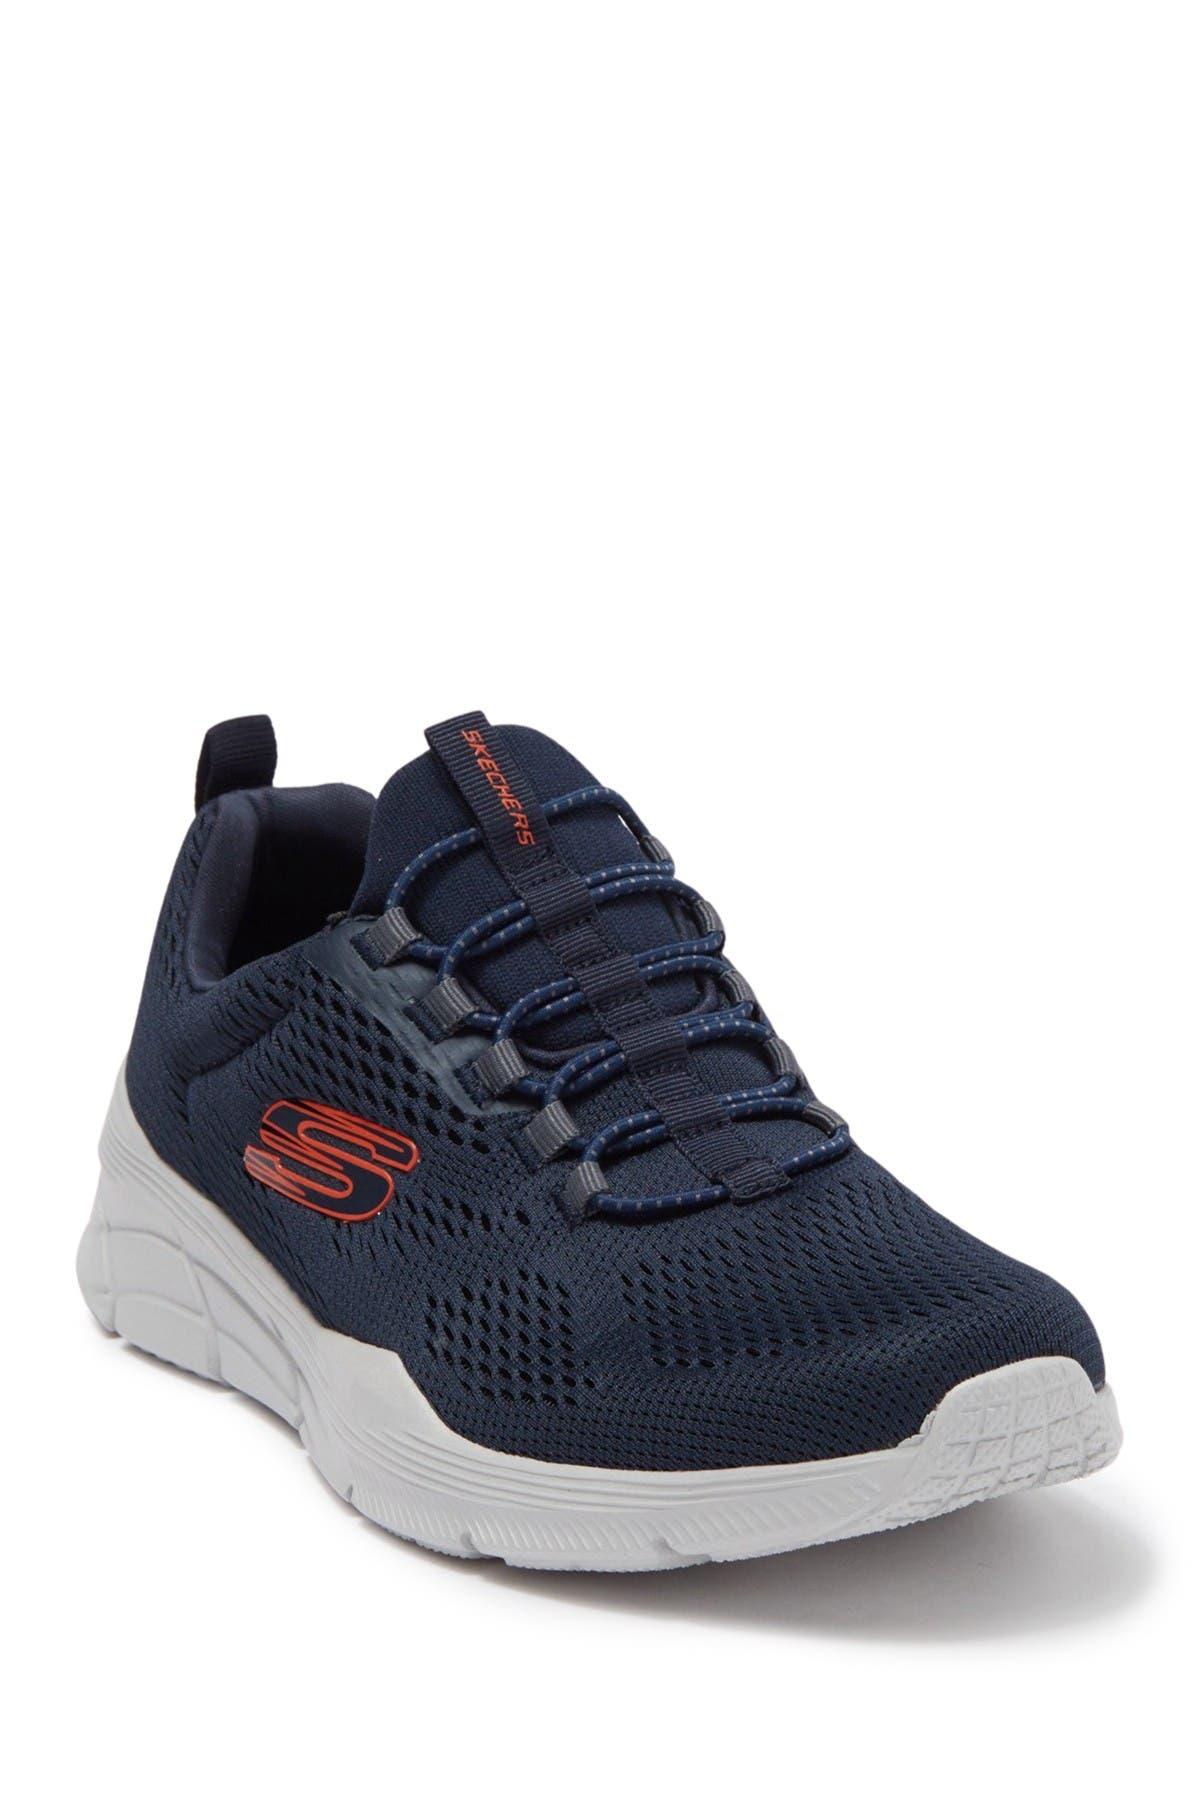 Image of Skechers Equalizer 4.0 Sneaker